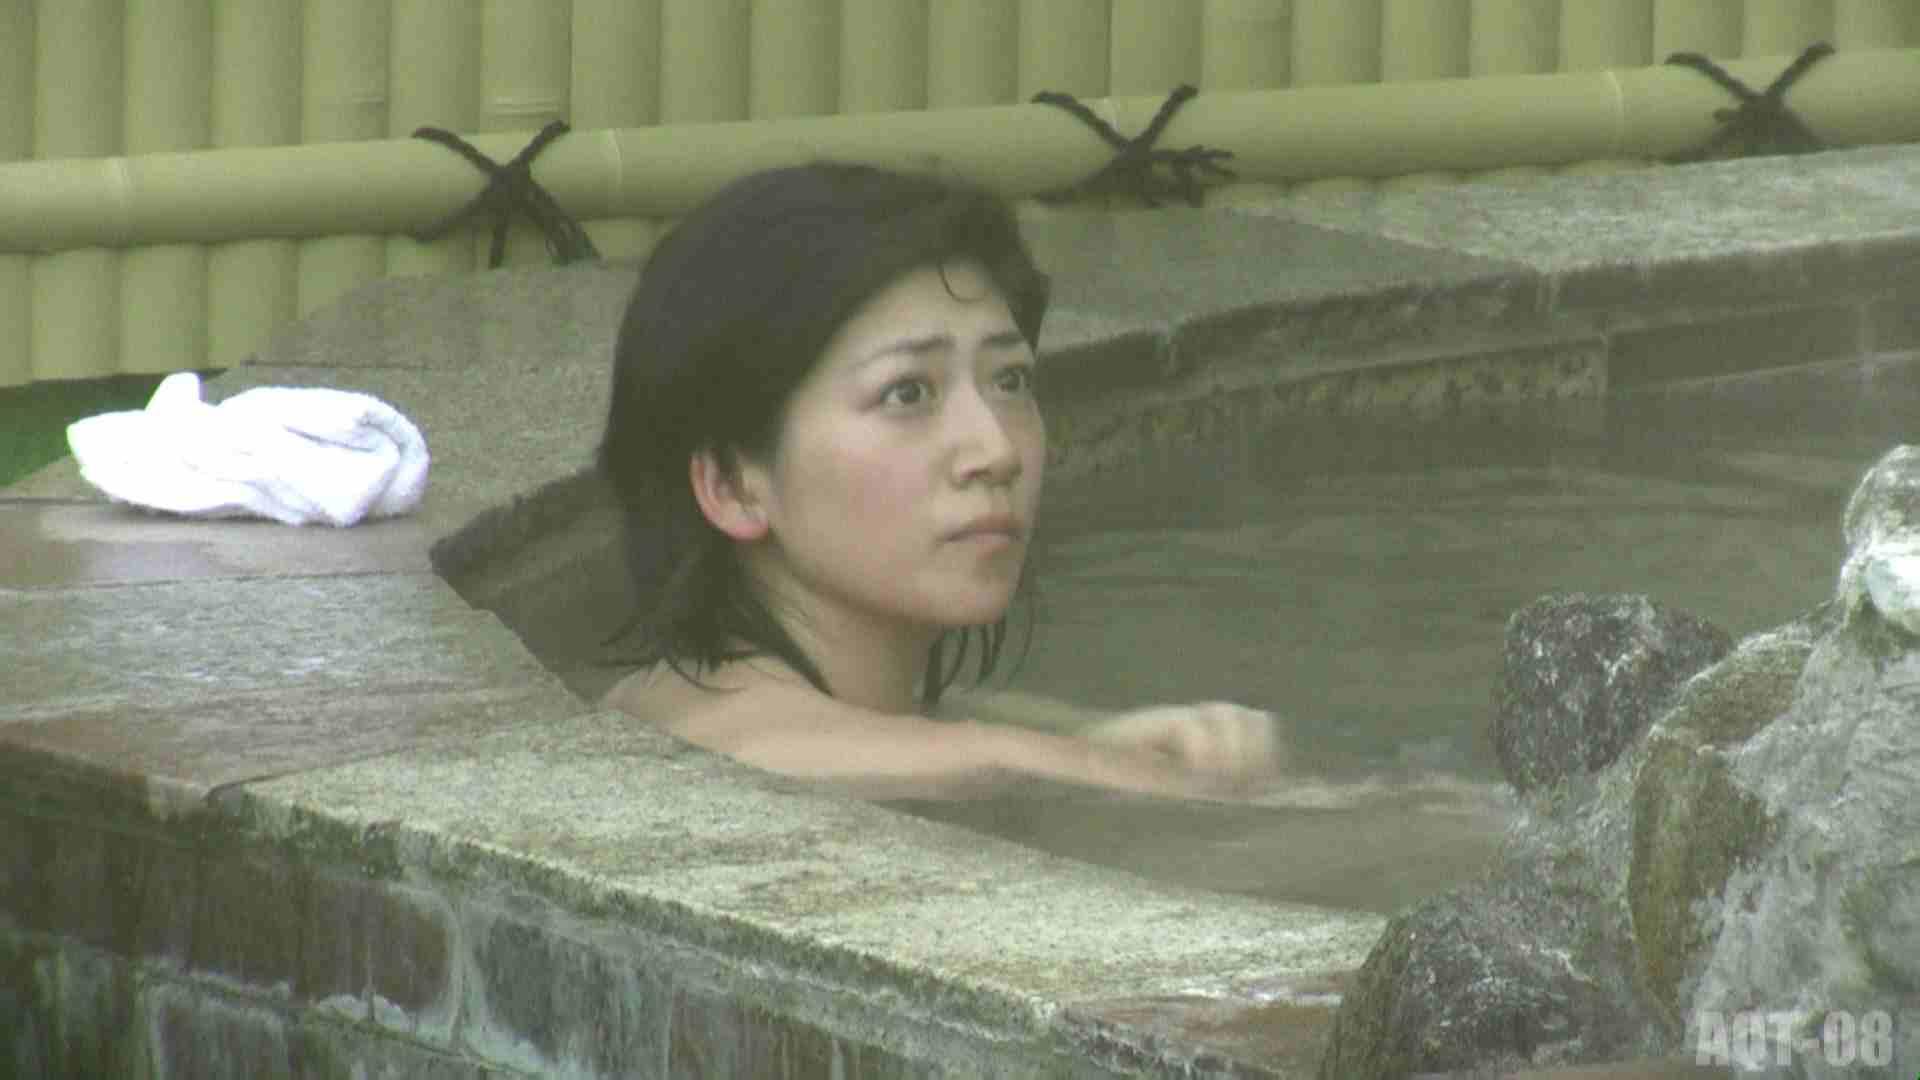 Aquaな露天風呂Vol.776 露天 | OLセックス  108画像 73